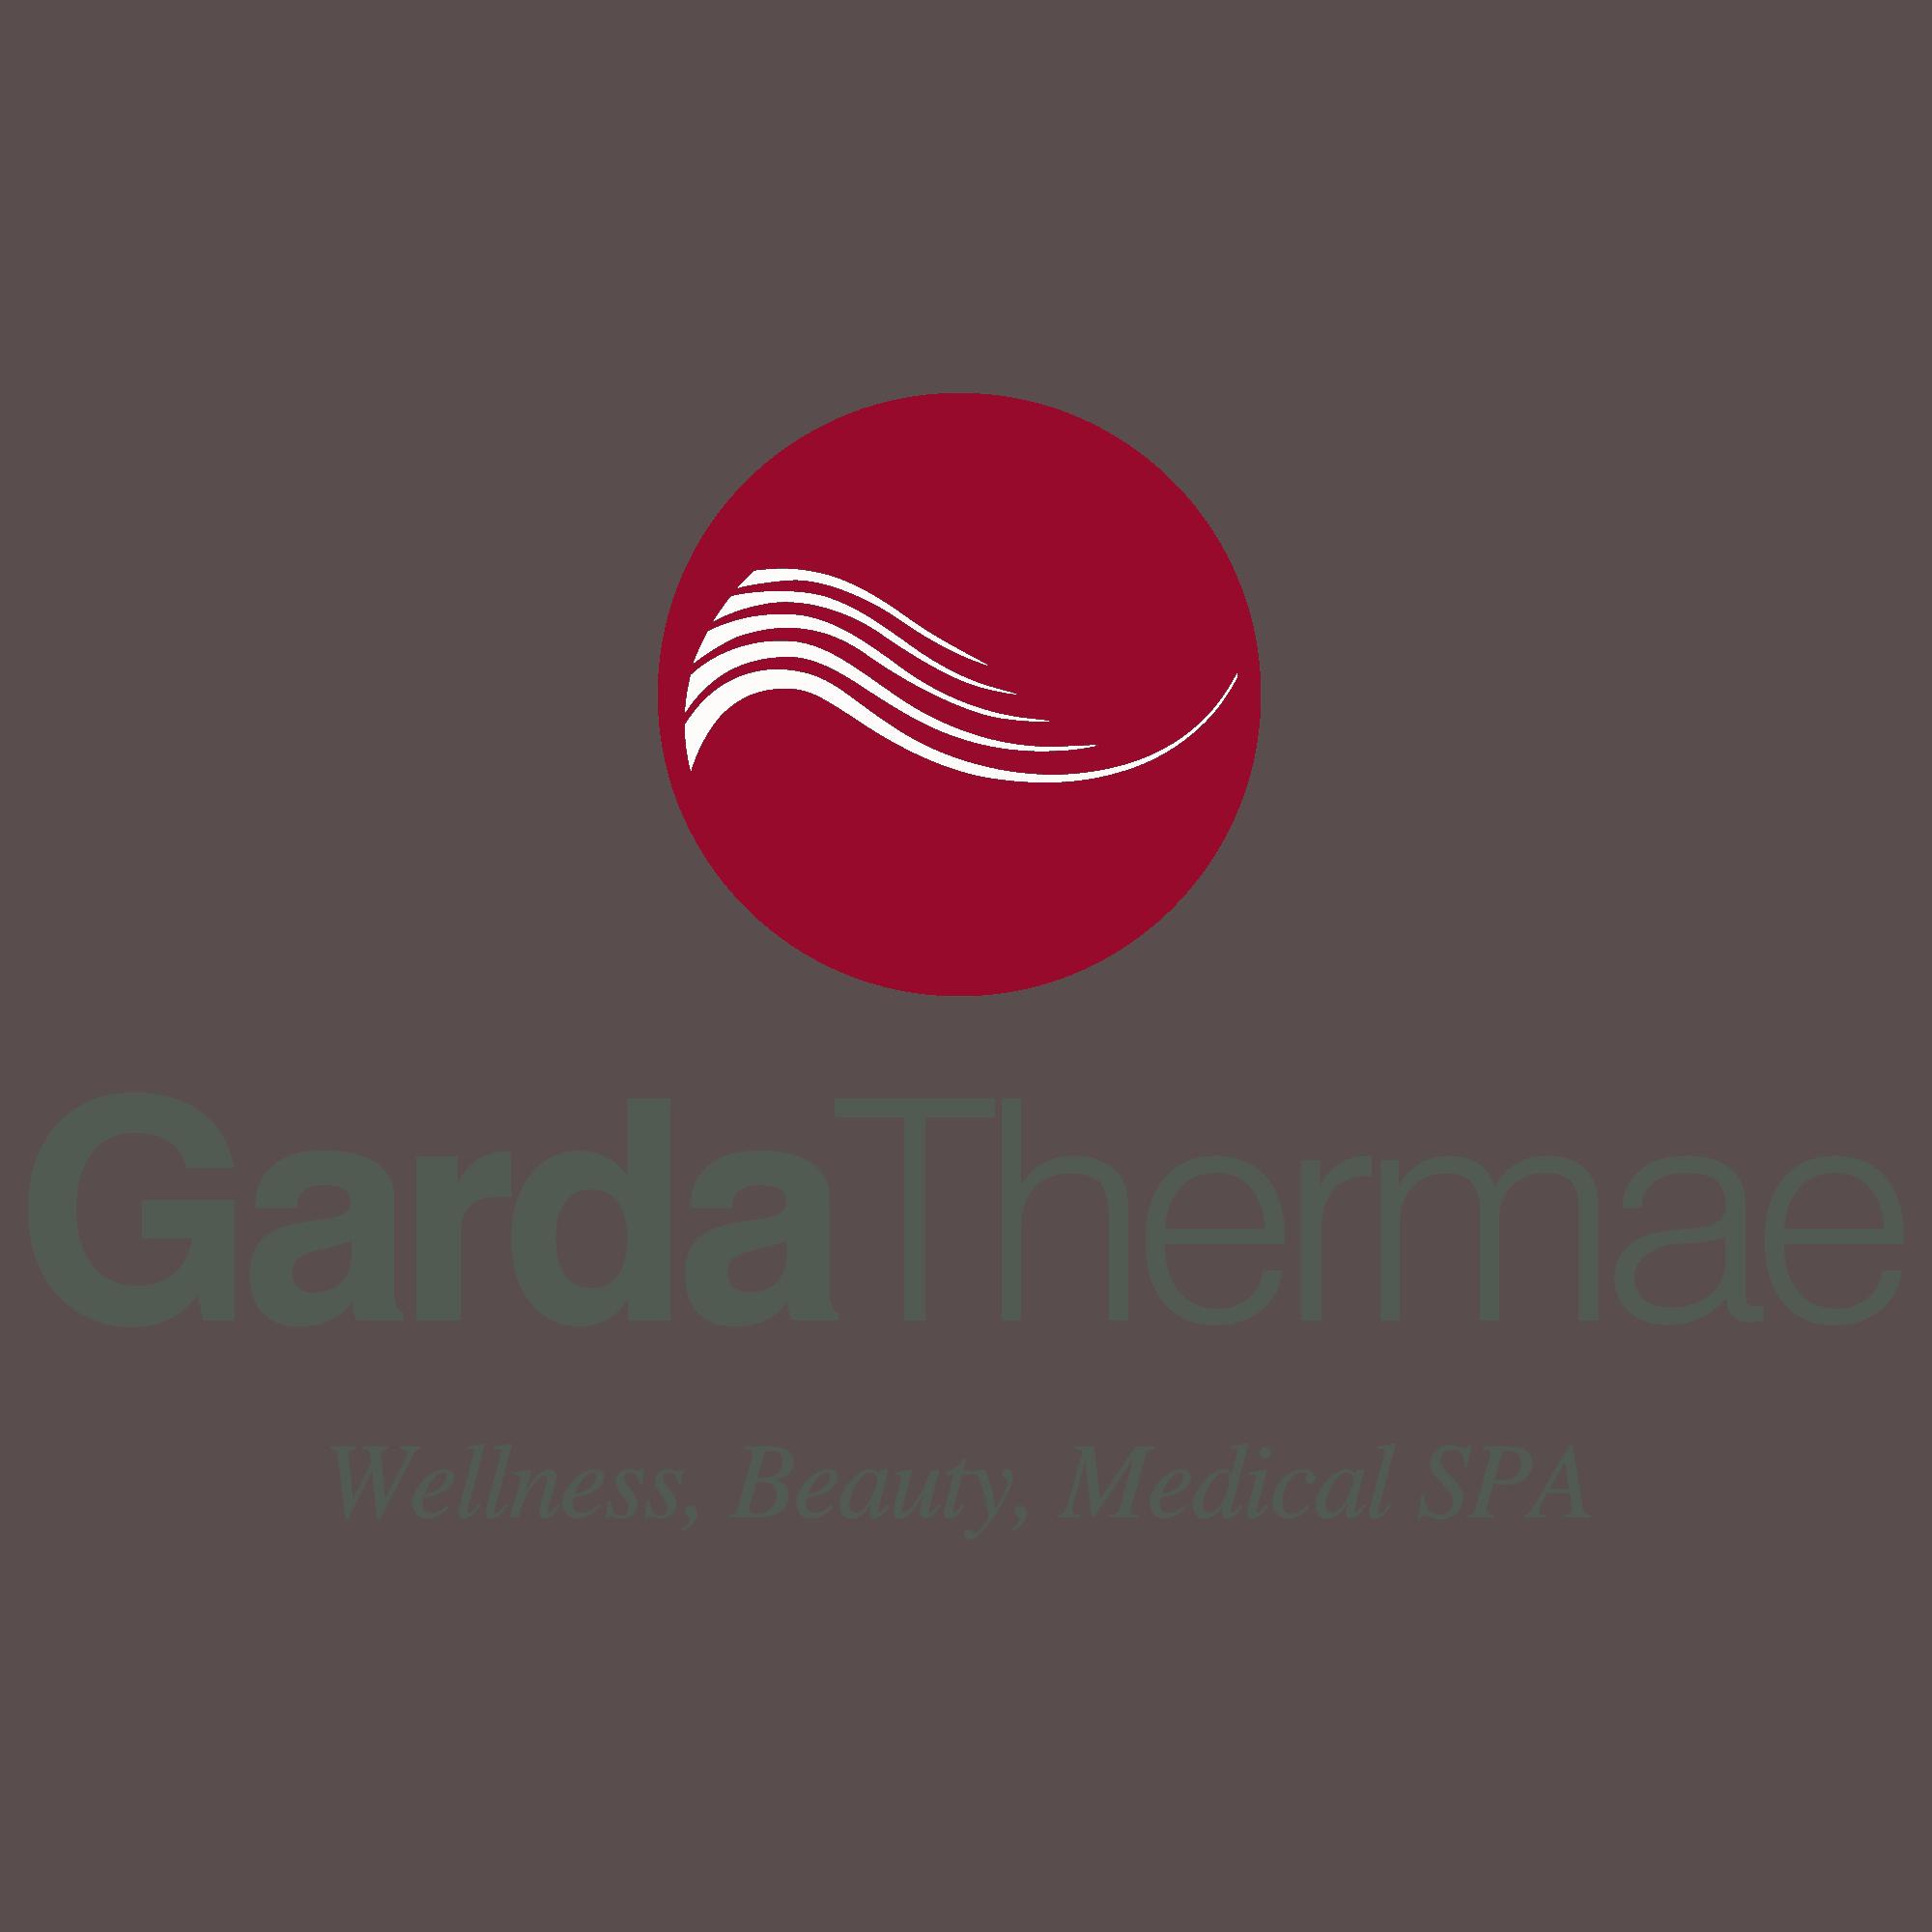 Garda Thermae a Linfano tra Riva del Garda, Arco e Torbole sul garda